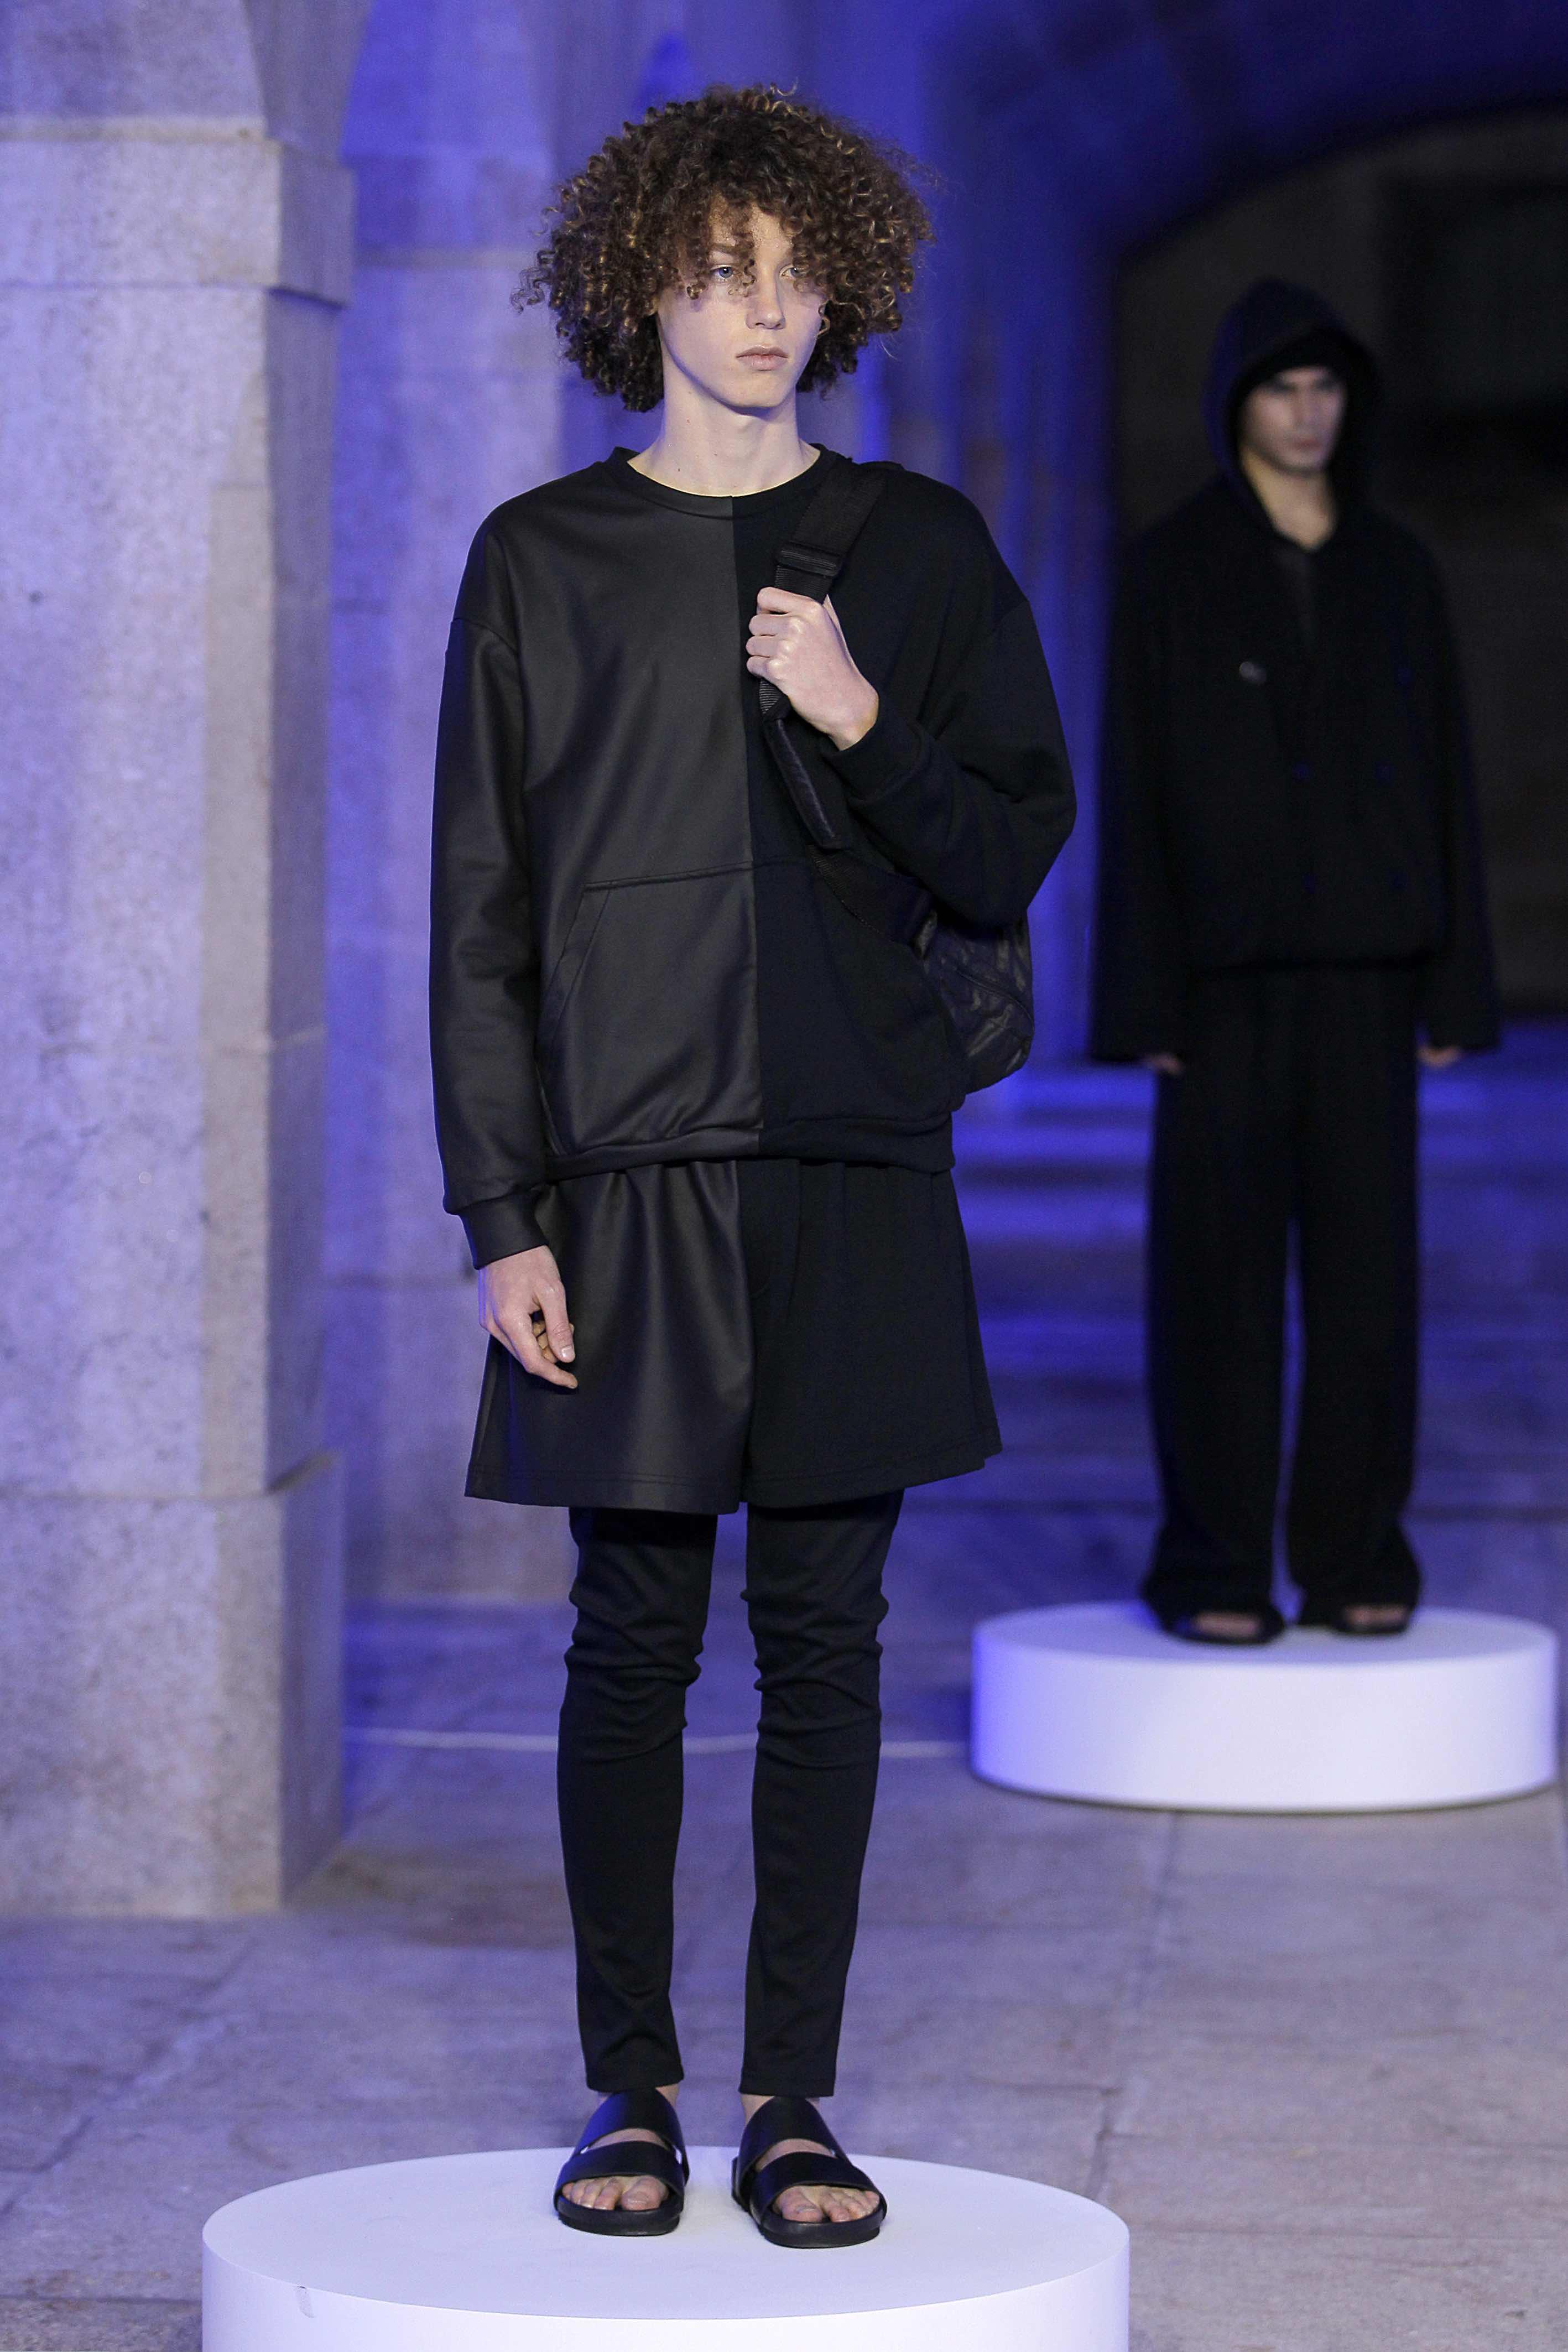 Portugal Fashion #SofaEdition 2